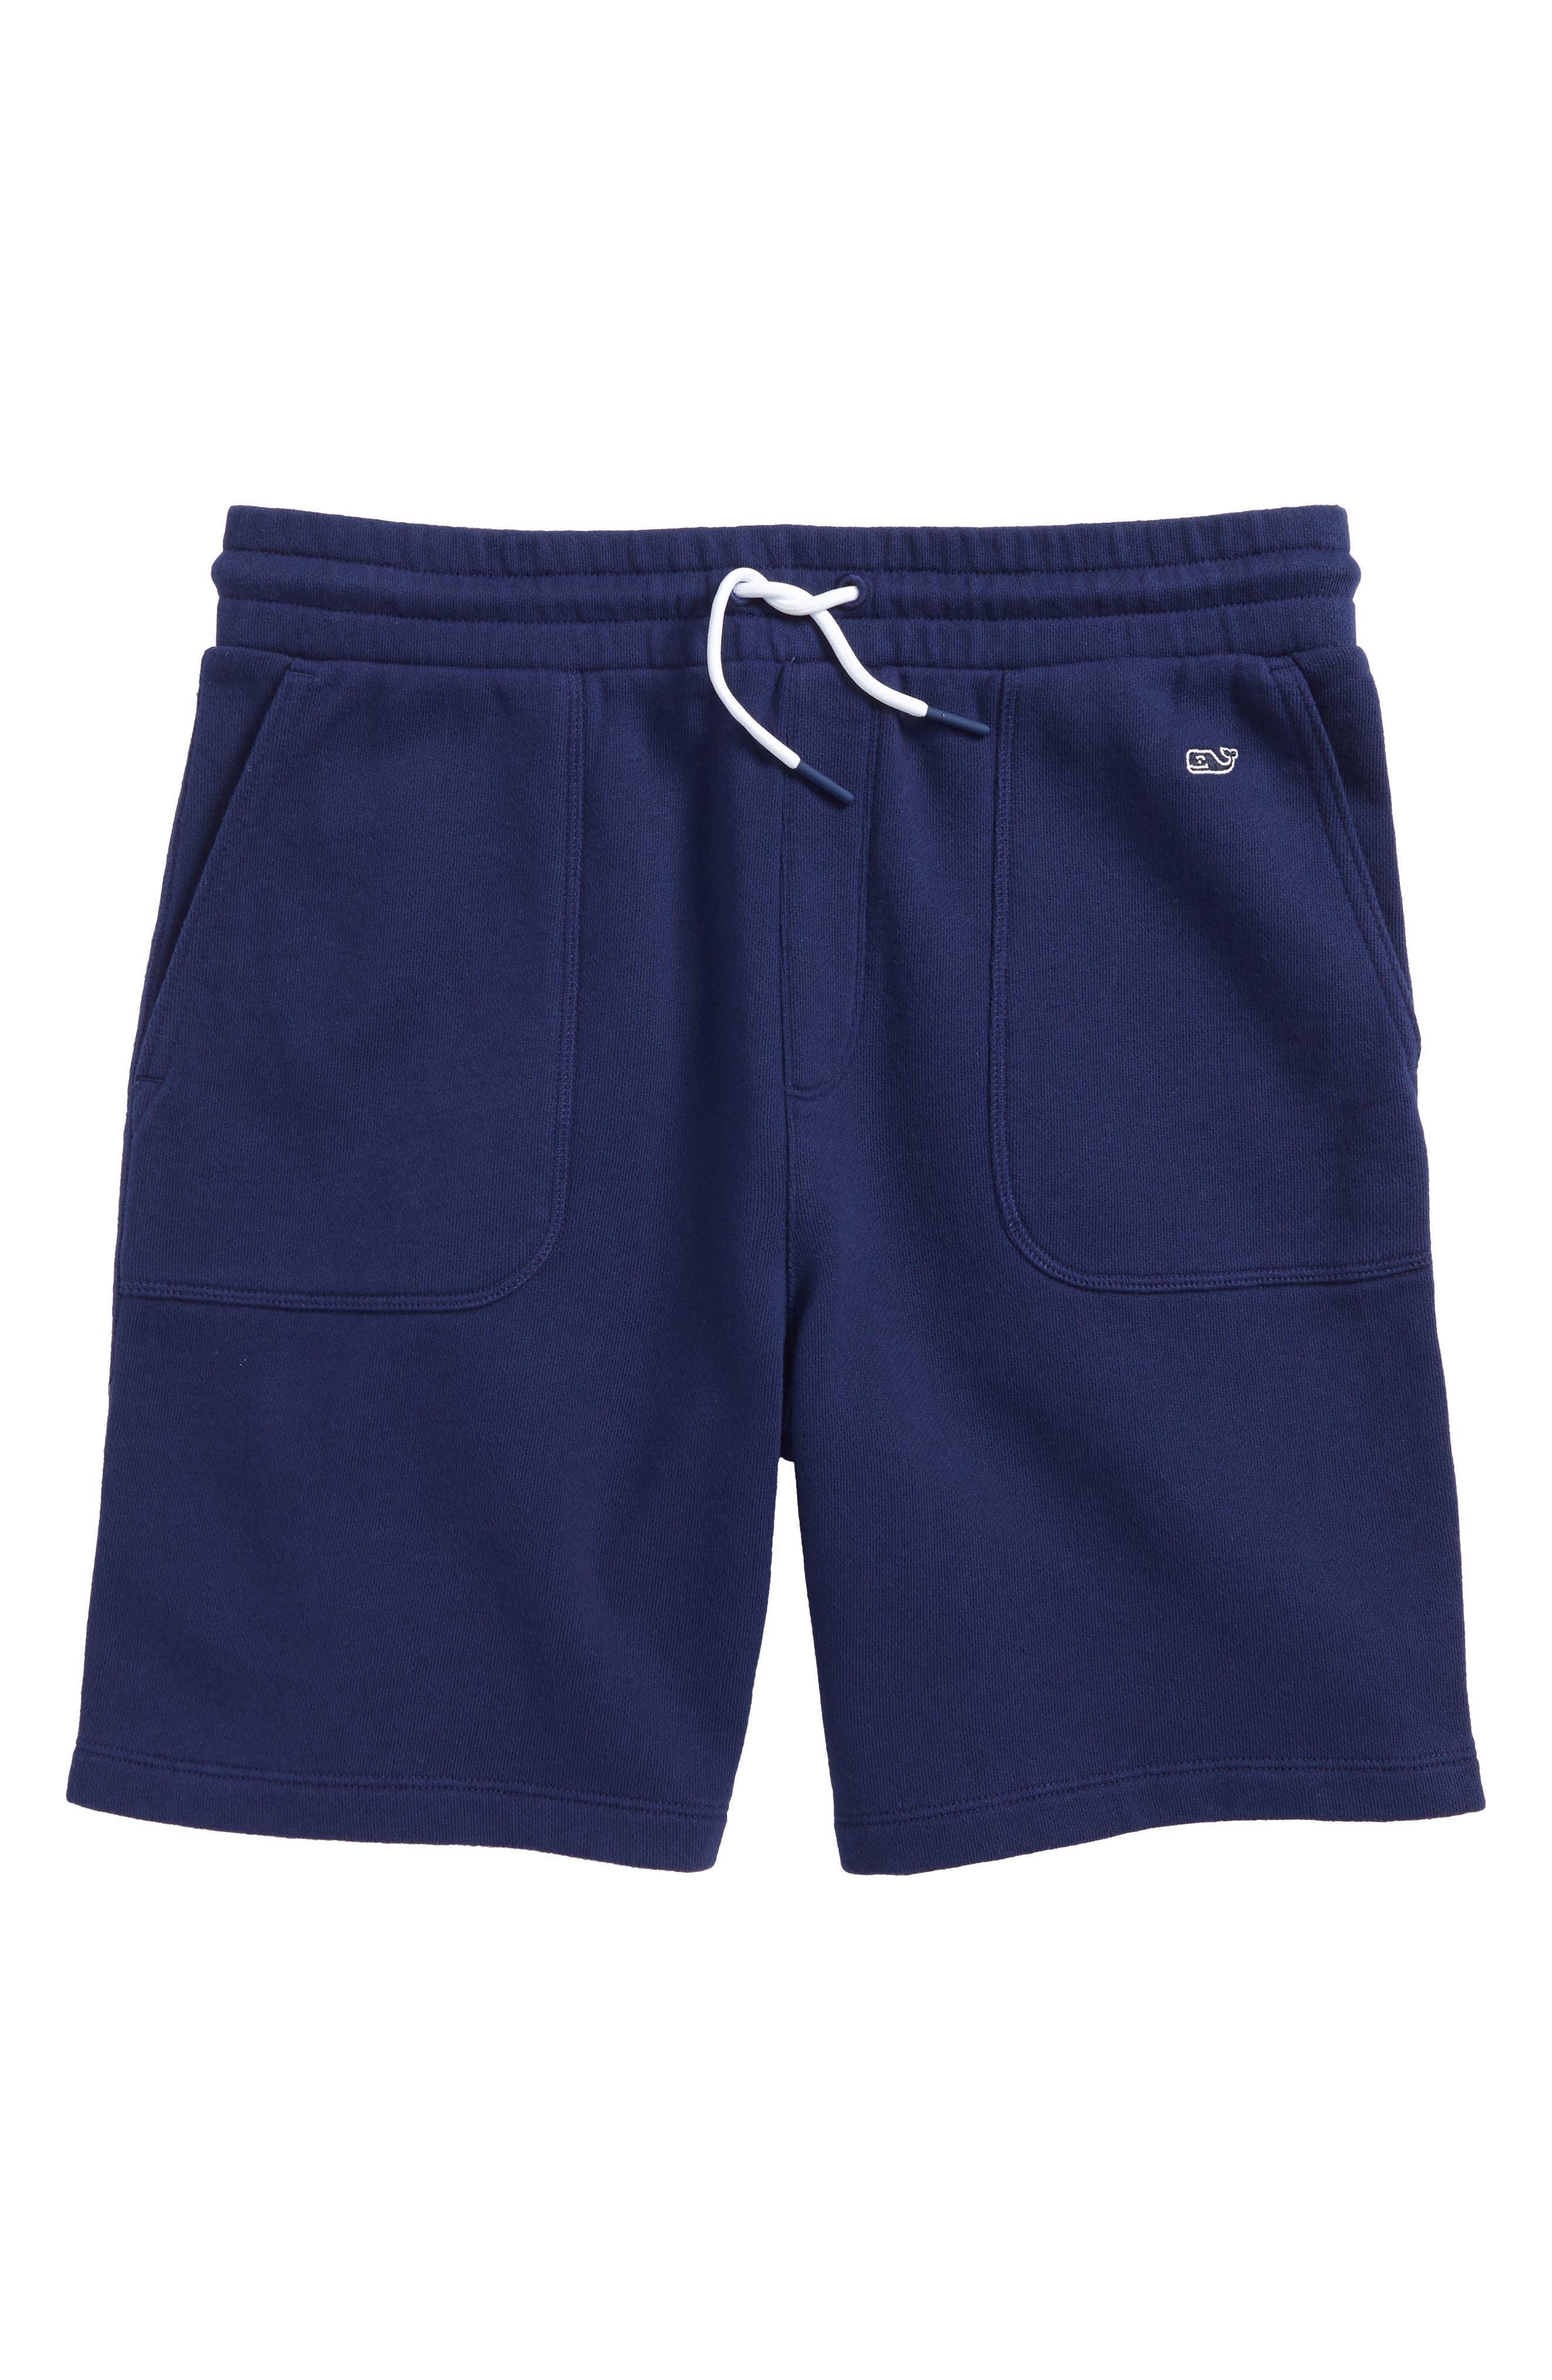 Garment Dyed Knit Shorts,                         Main,                         color, Deep Bay